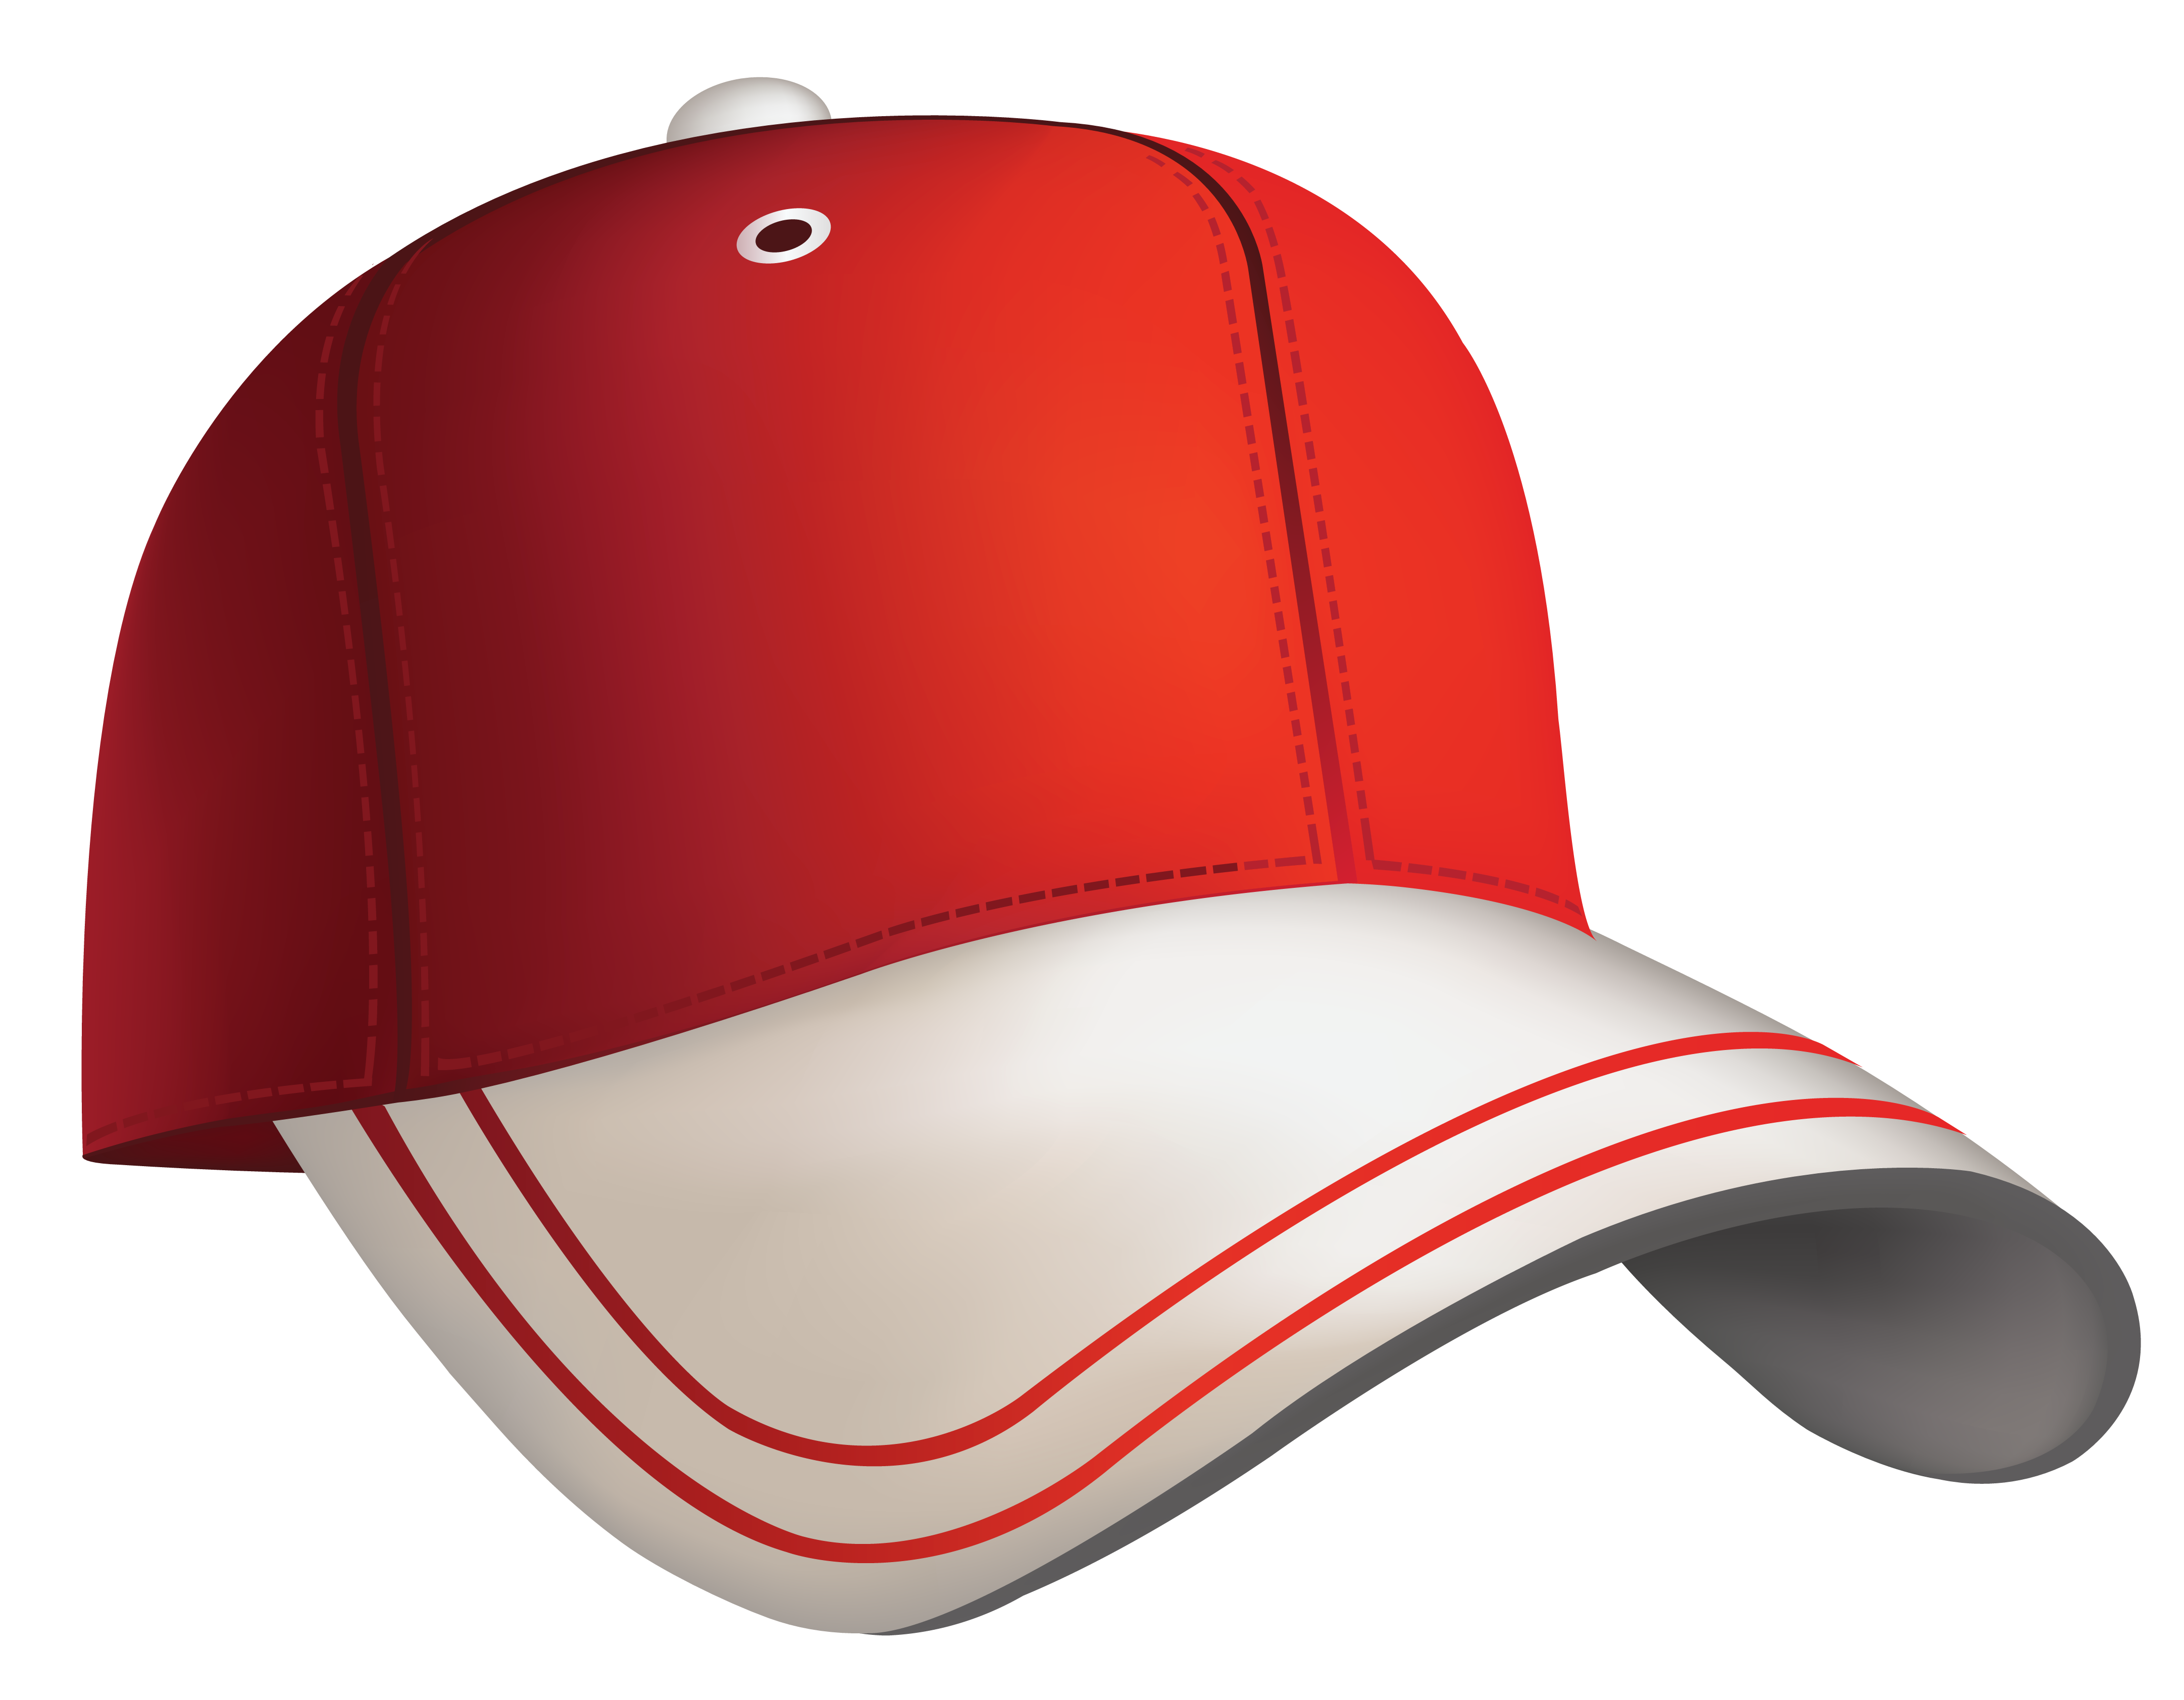 4325x3366 Red Baseball Cap Clipartu200b Gallery Yopriceville